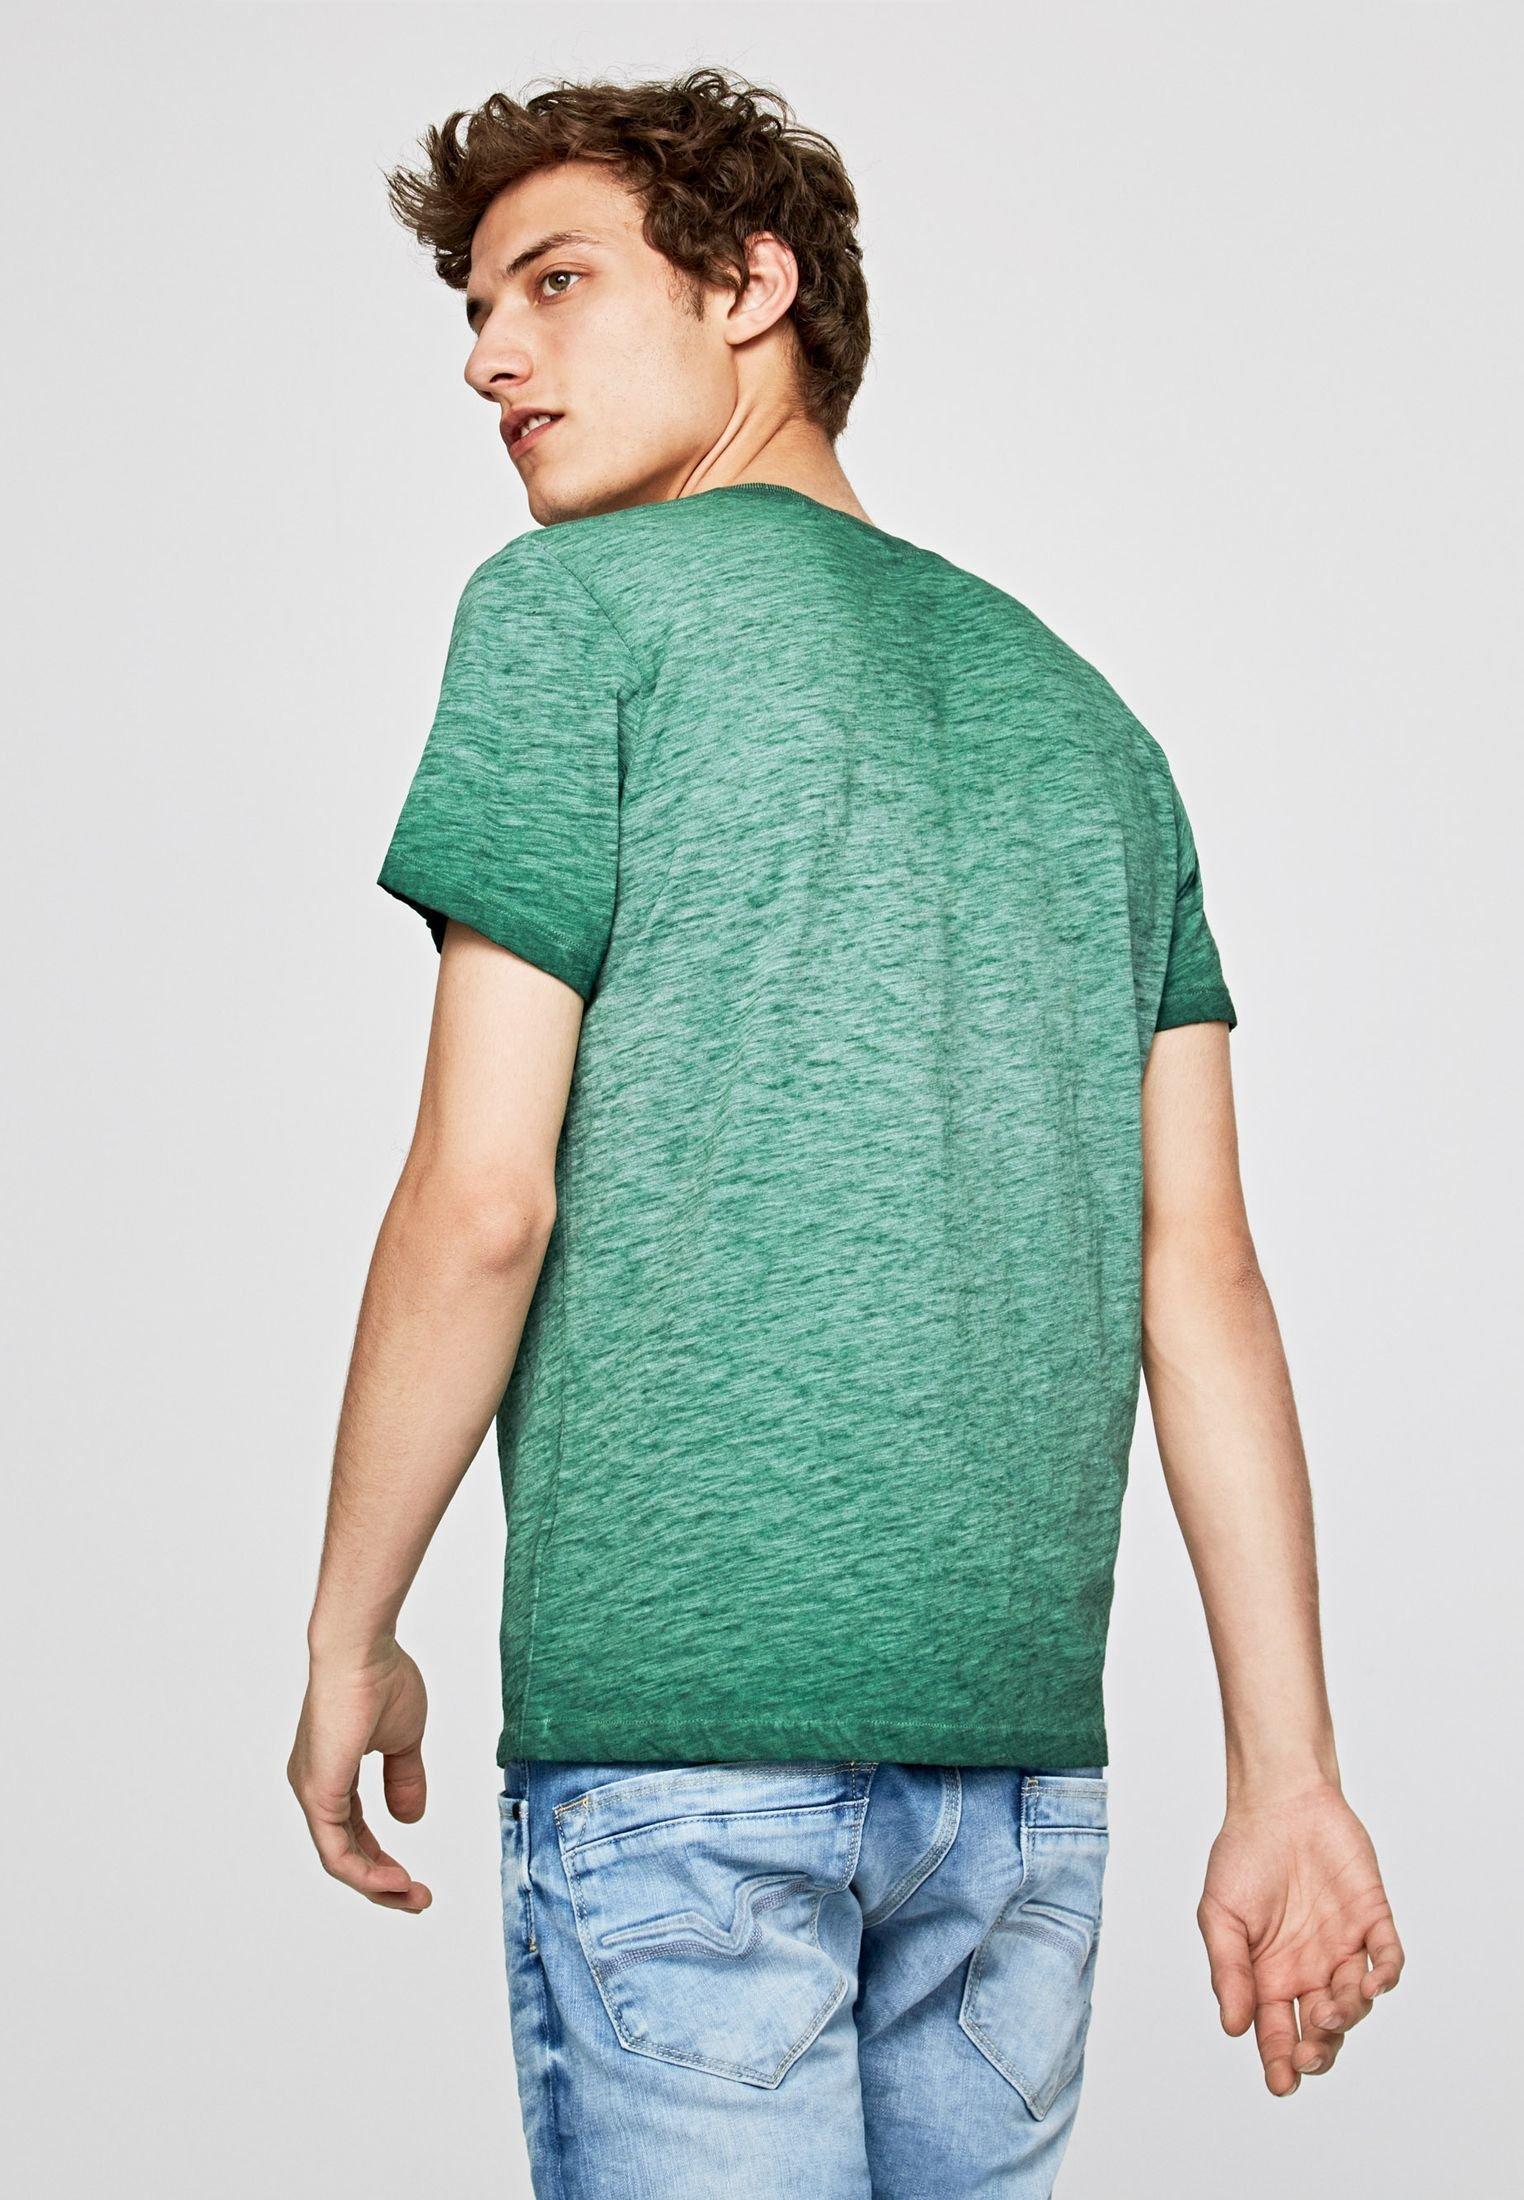 Pepe Shirt green print Jeans DONT Ybfgy6I7v